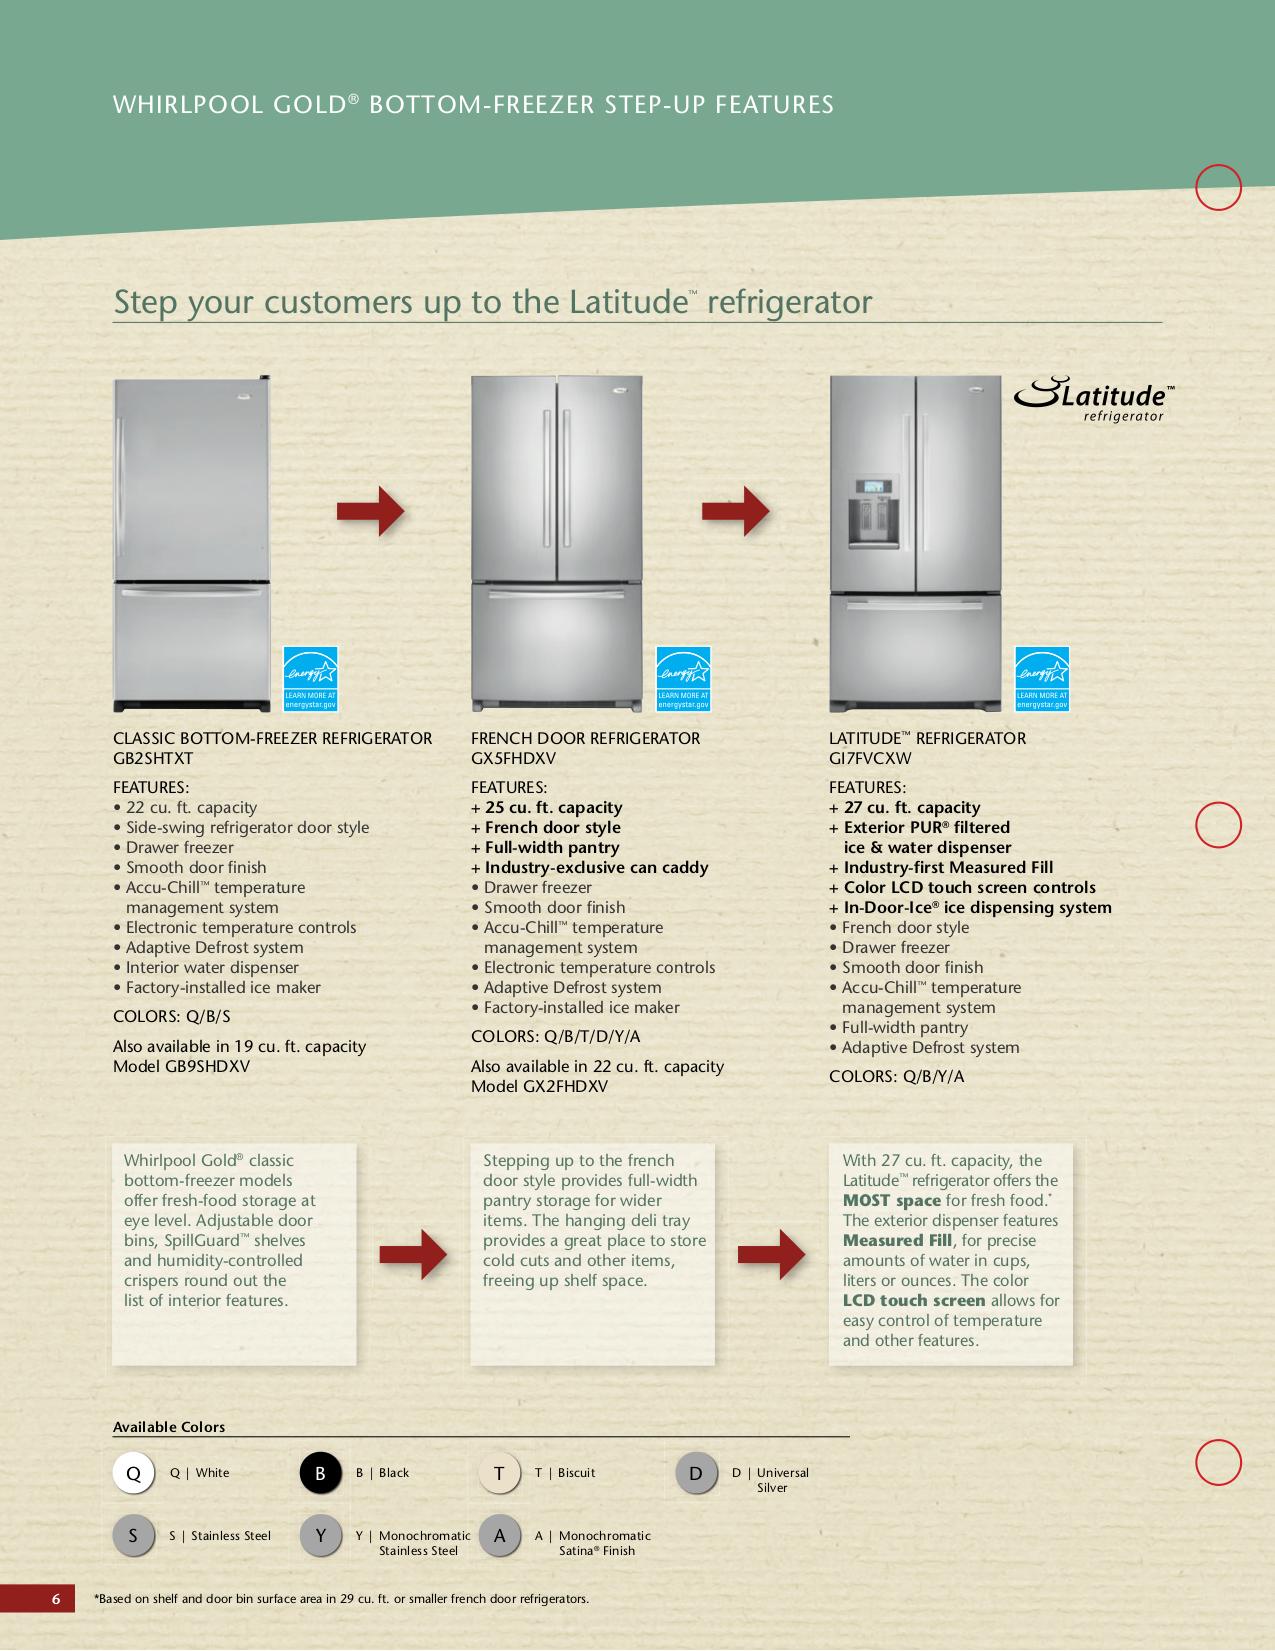 Gx5fhdxv Whirlpool Refrigerator Schematic Diagram Electrical Wiring For Gx5fhdxvb Pdf Manual Gold Dishwasher